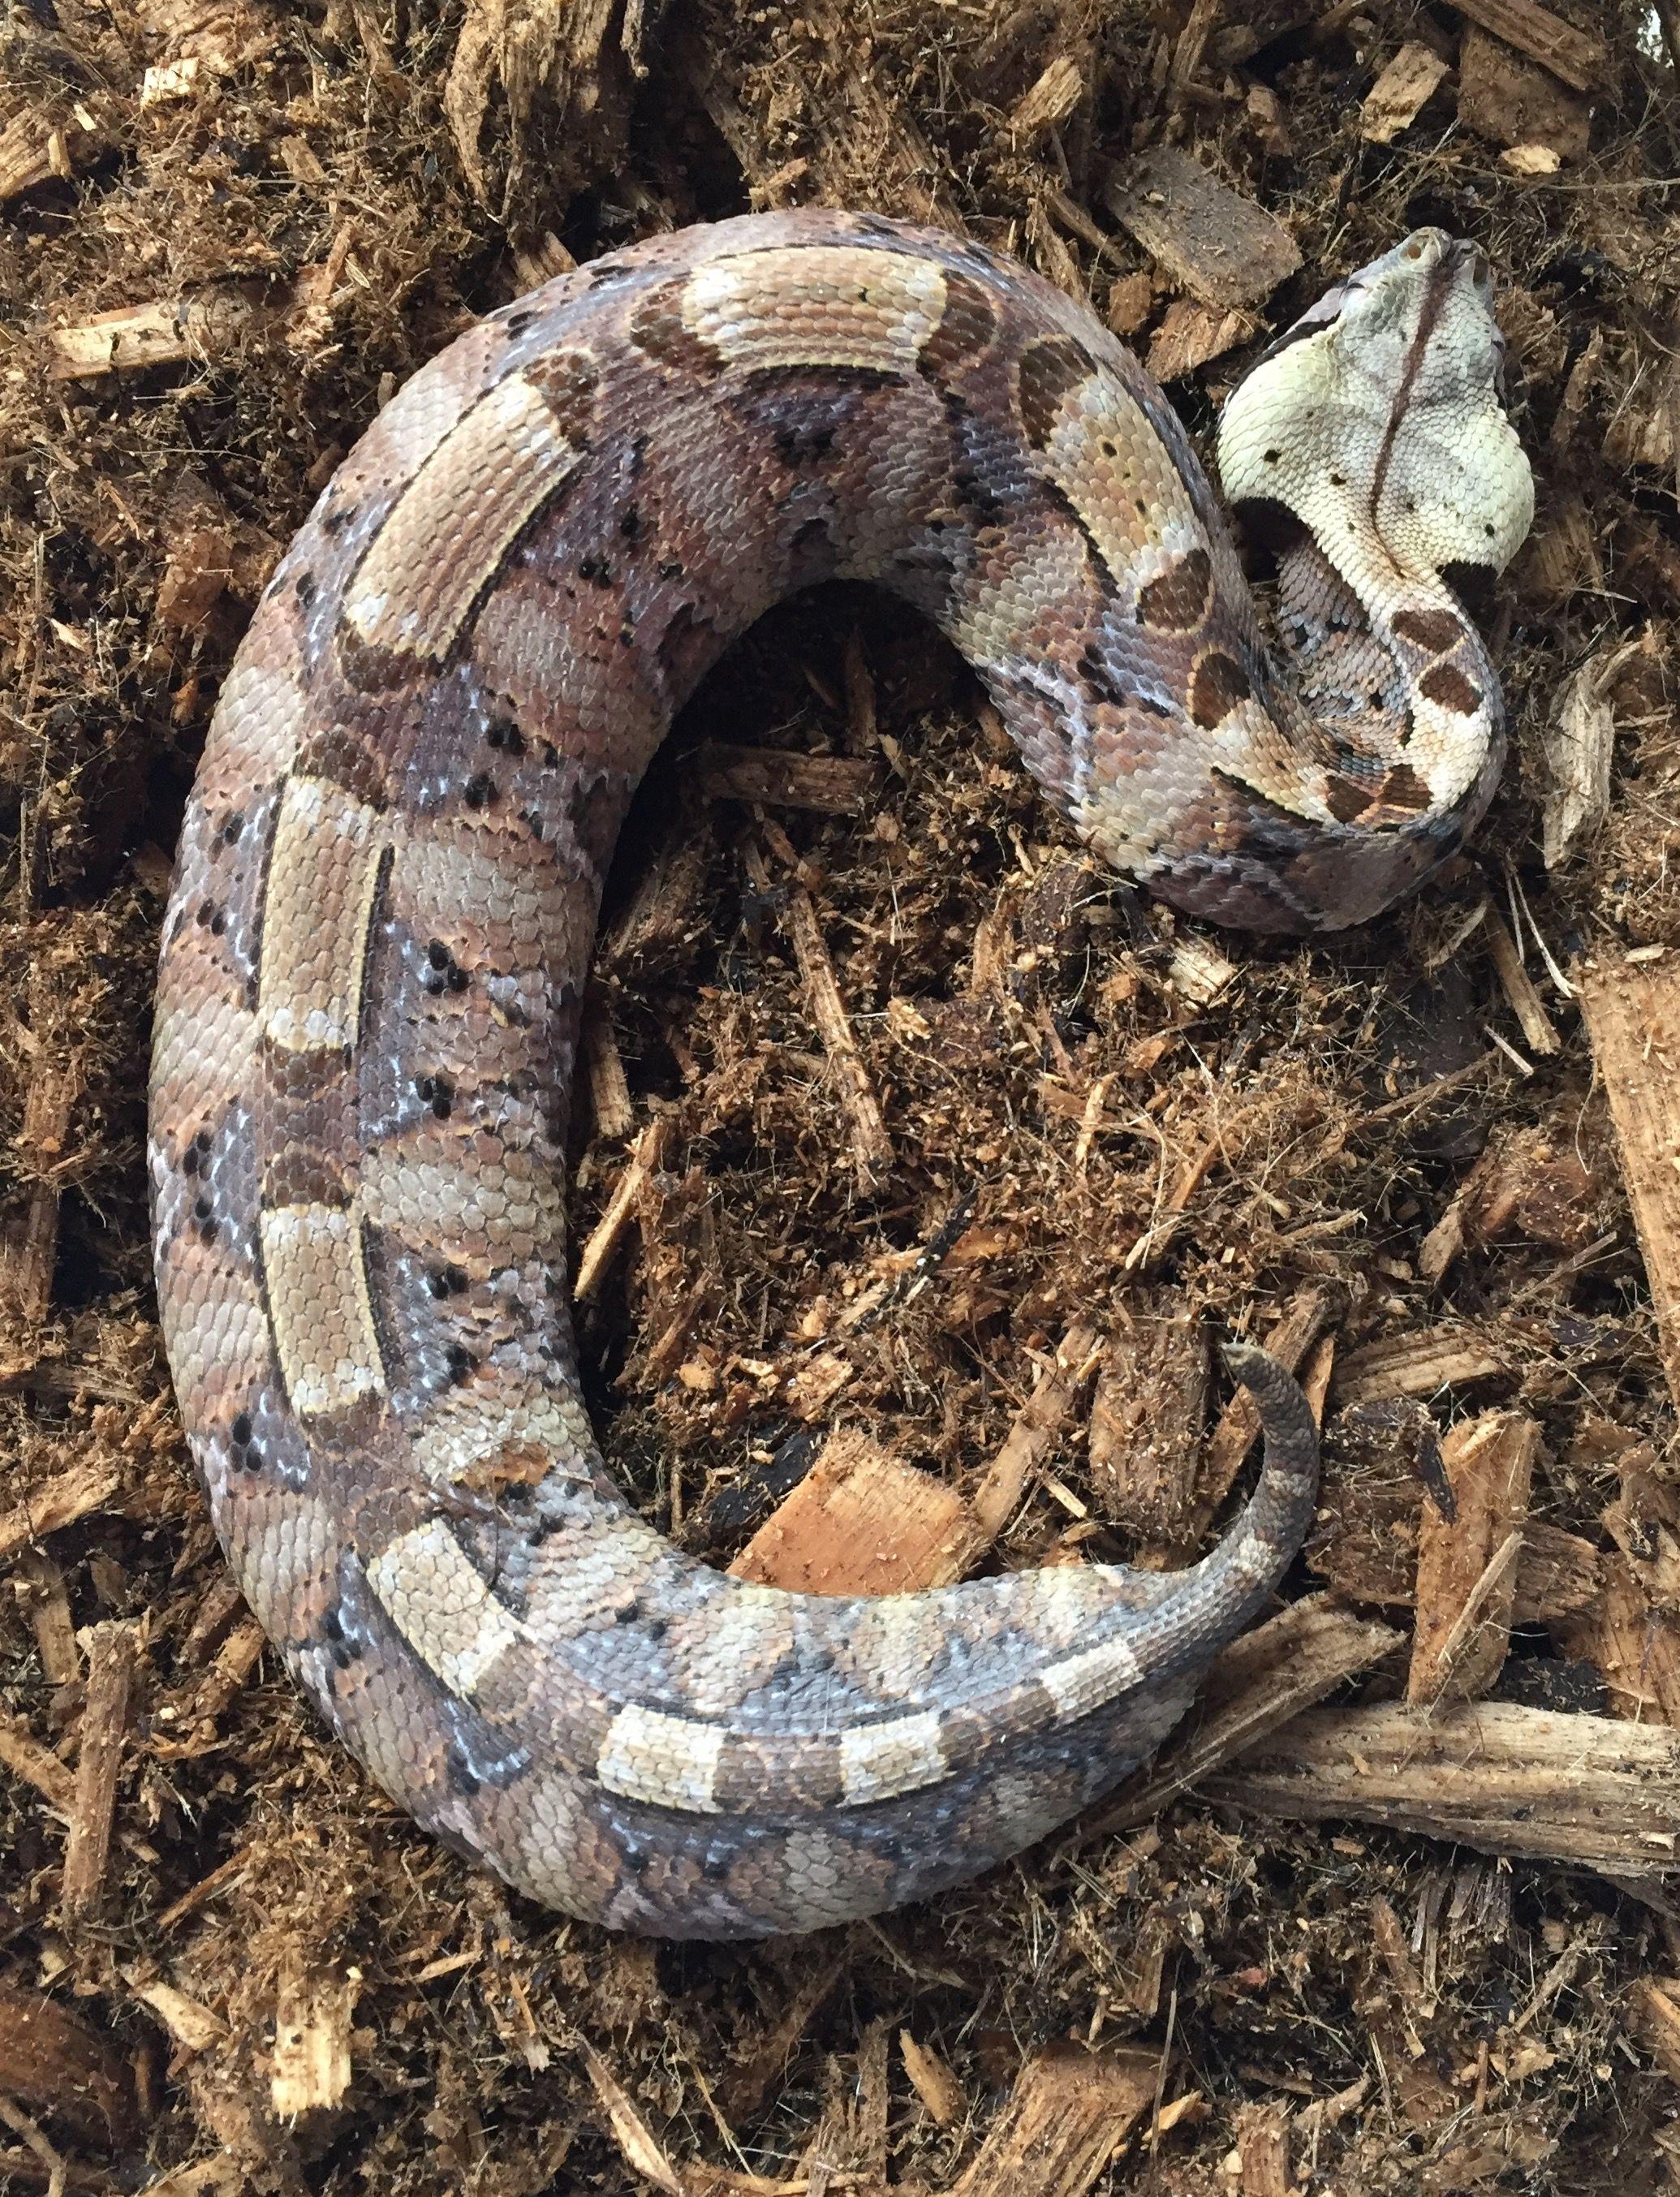 West African Carpet Viper - Carpet Vidalondon